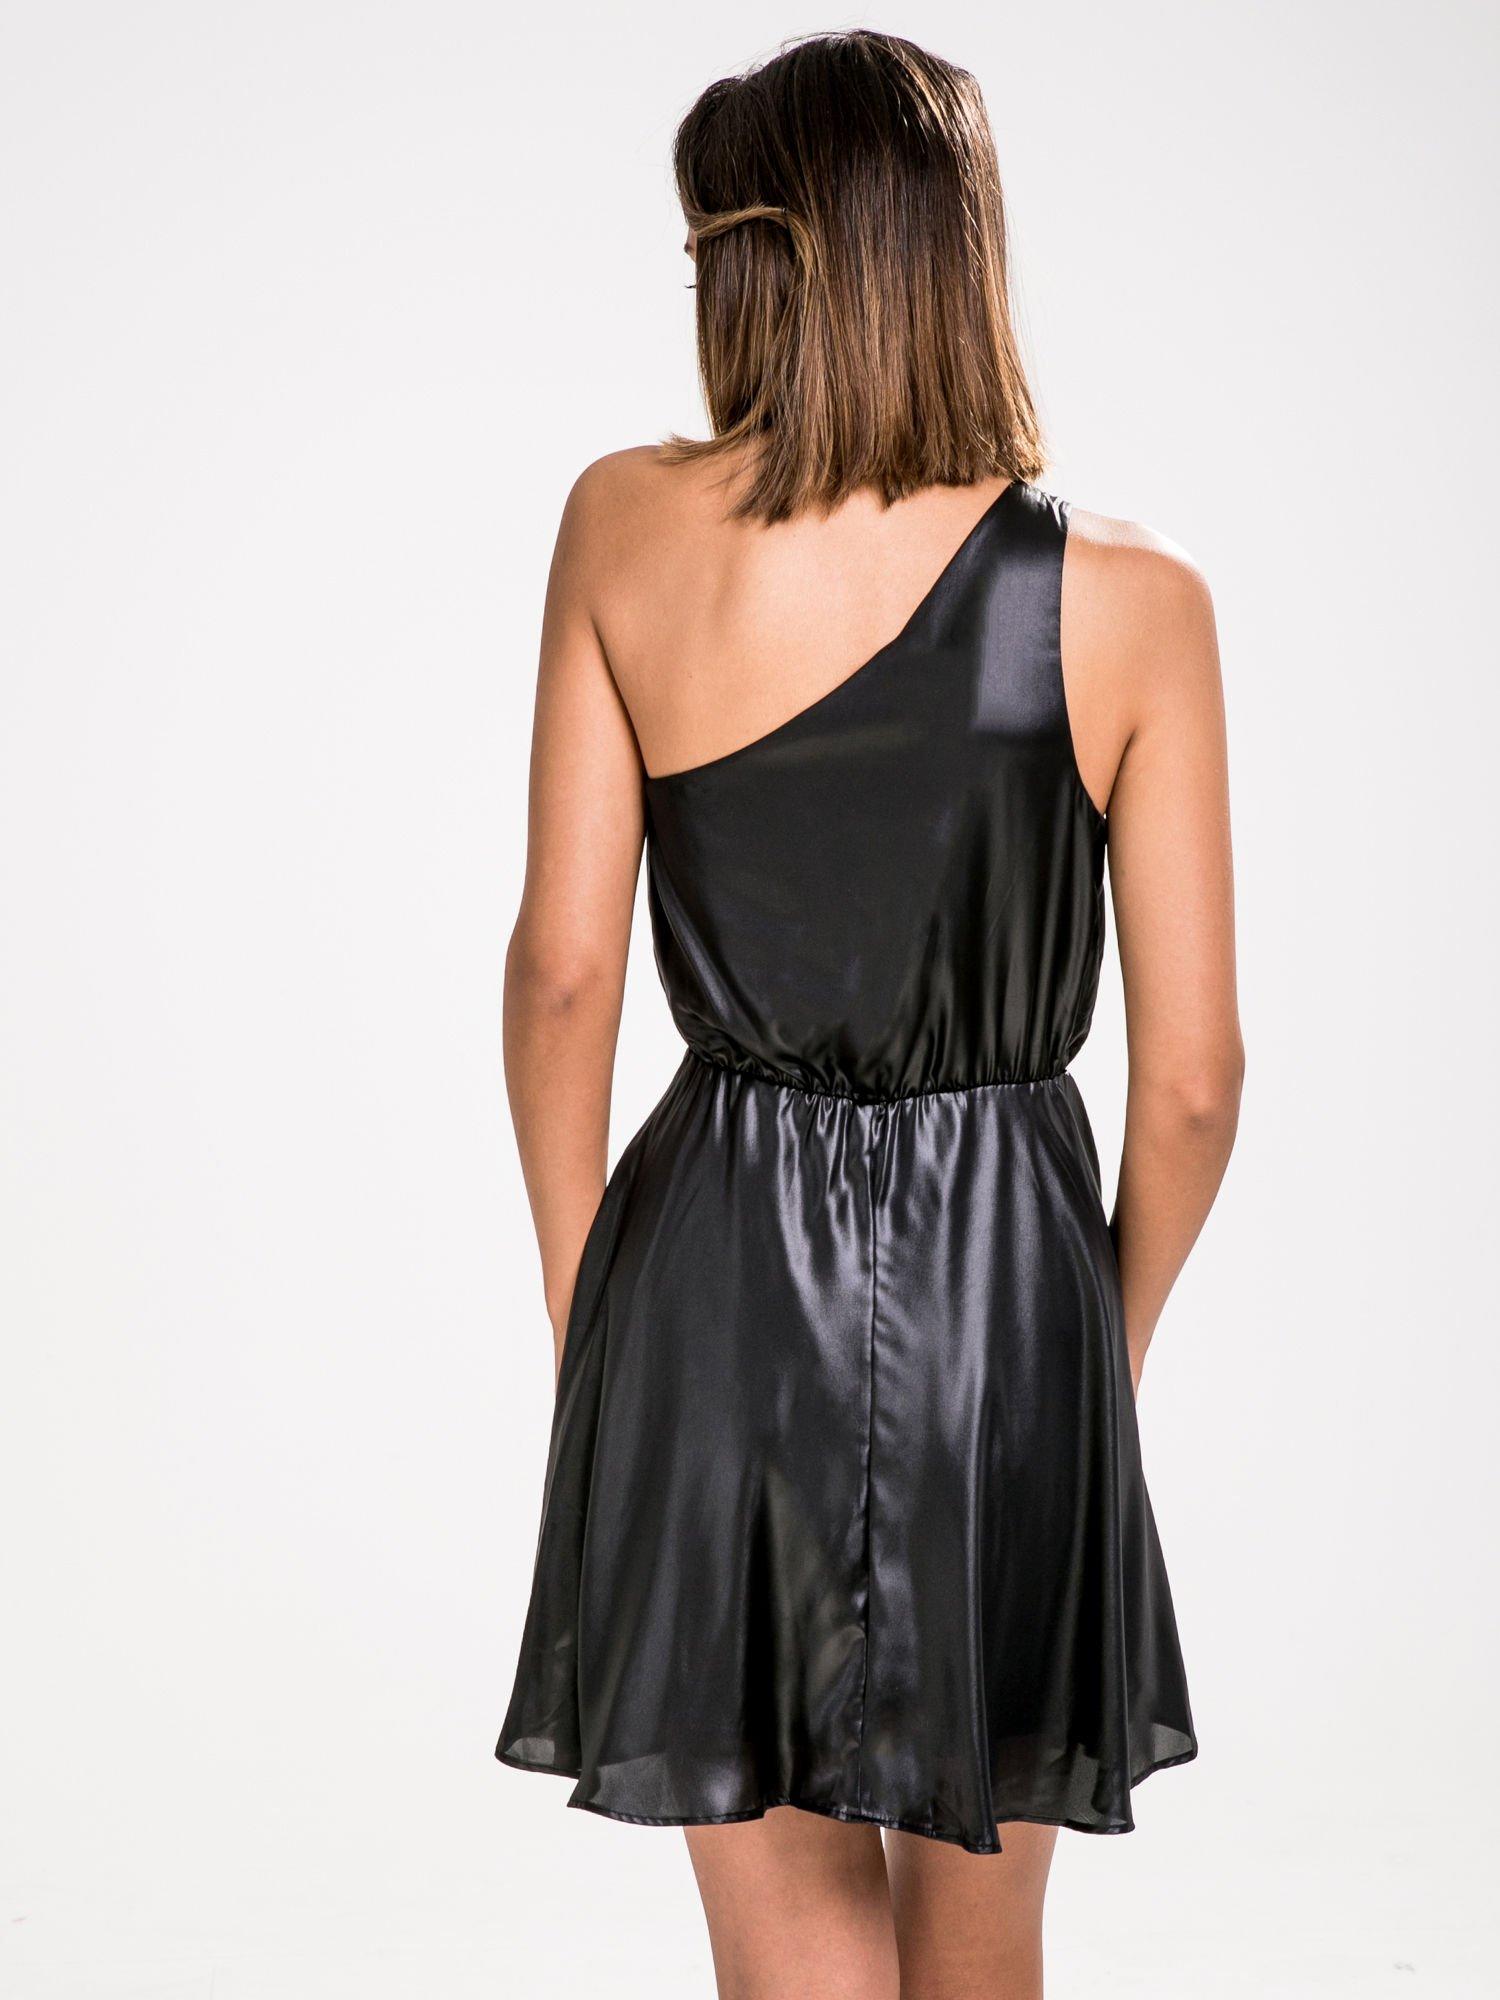 STRADIVARIUS Czarna skórzana sukienka na jedno ramię                                  zdj.                                  2